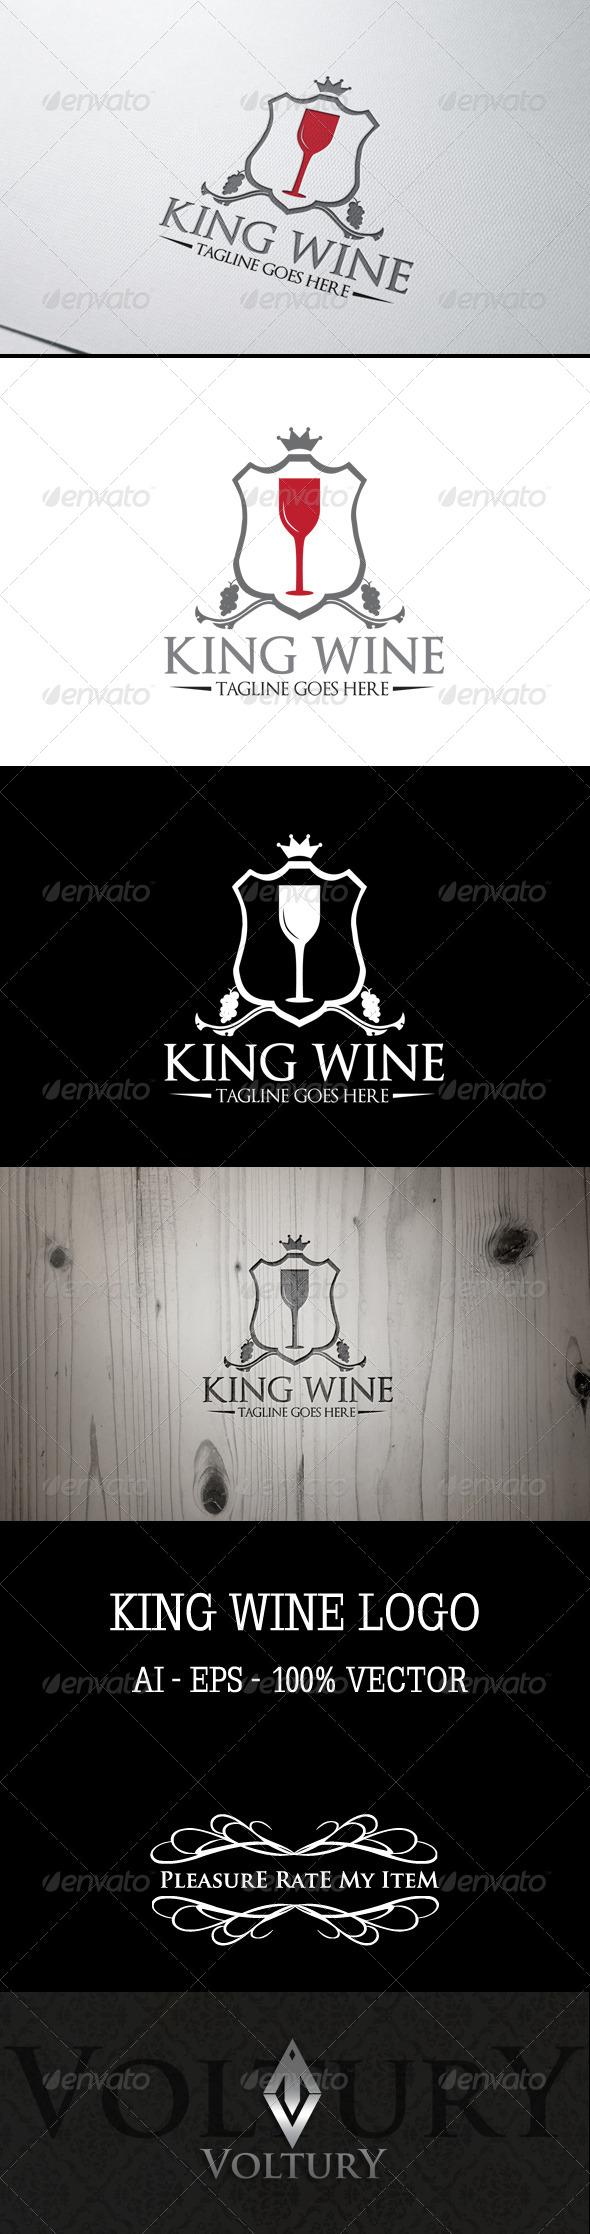 GraphicRiver King Wine Logo 7590791